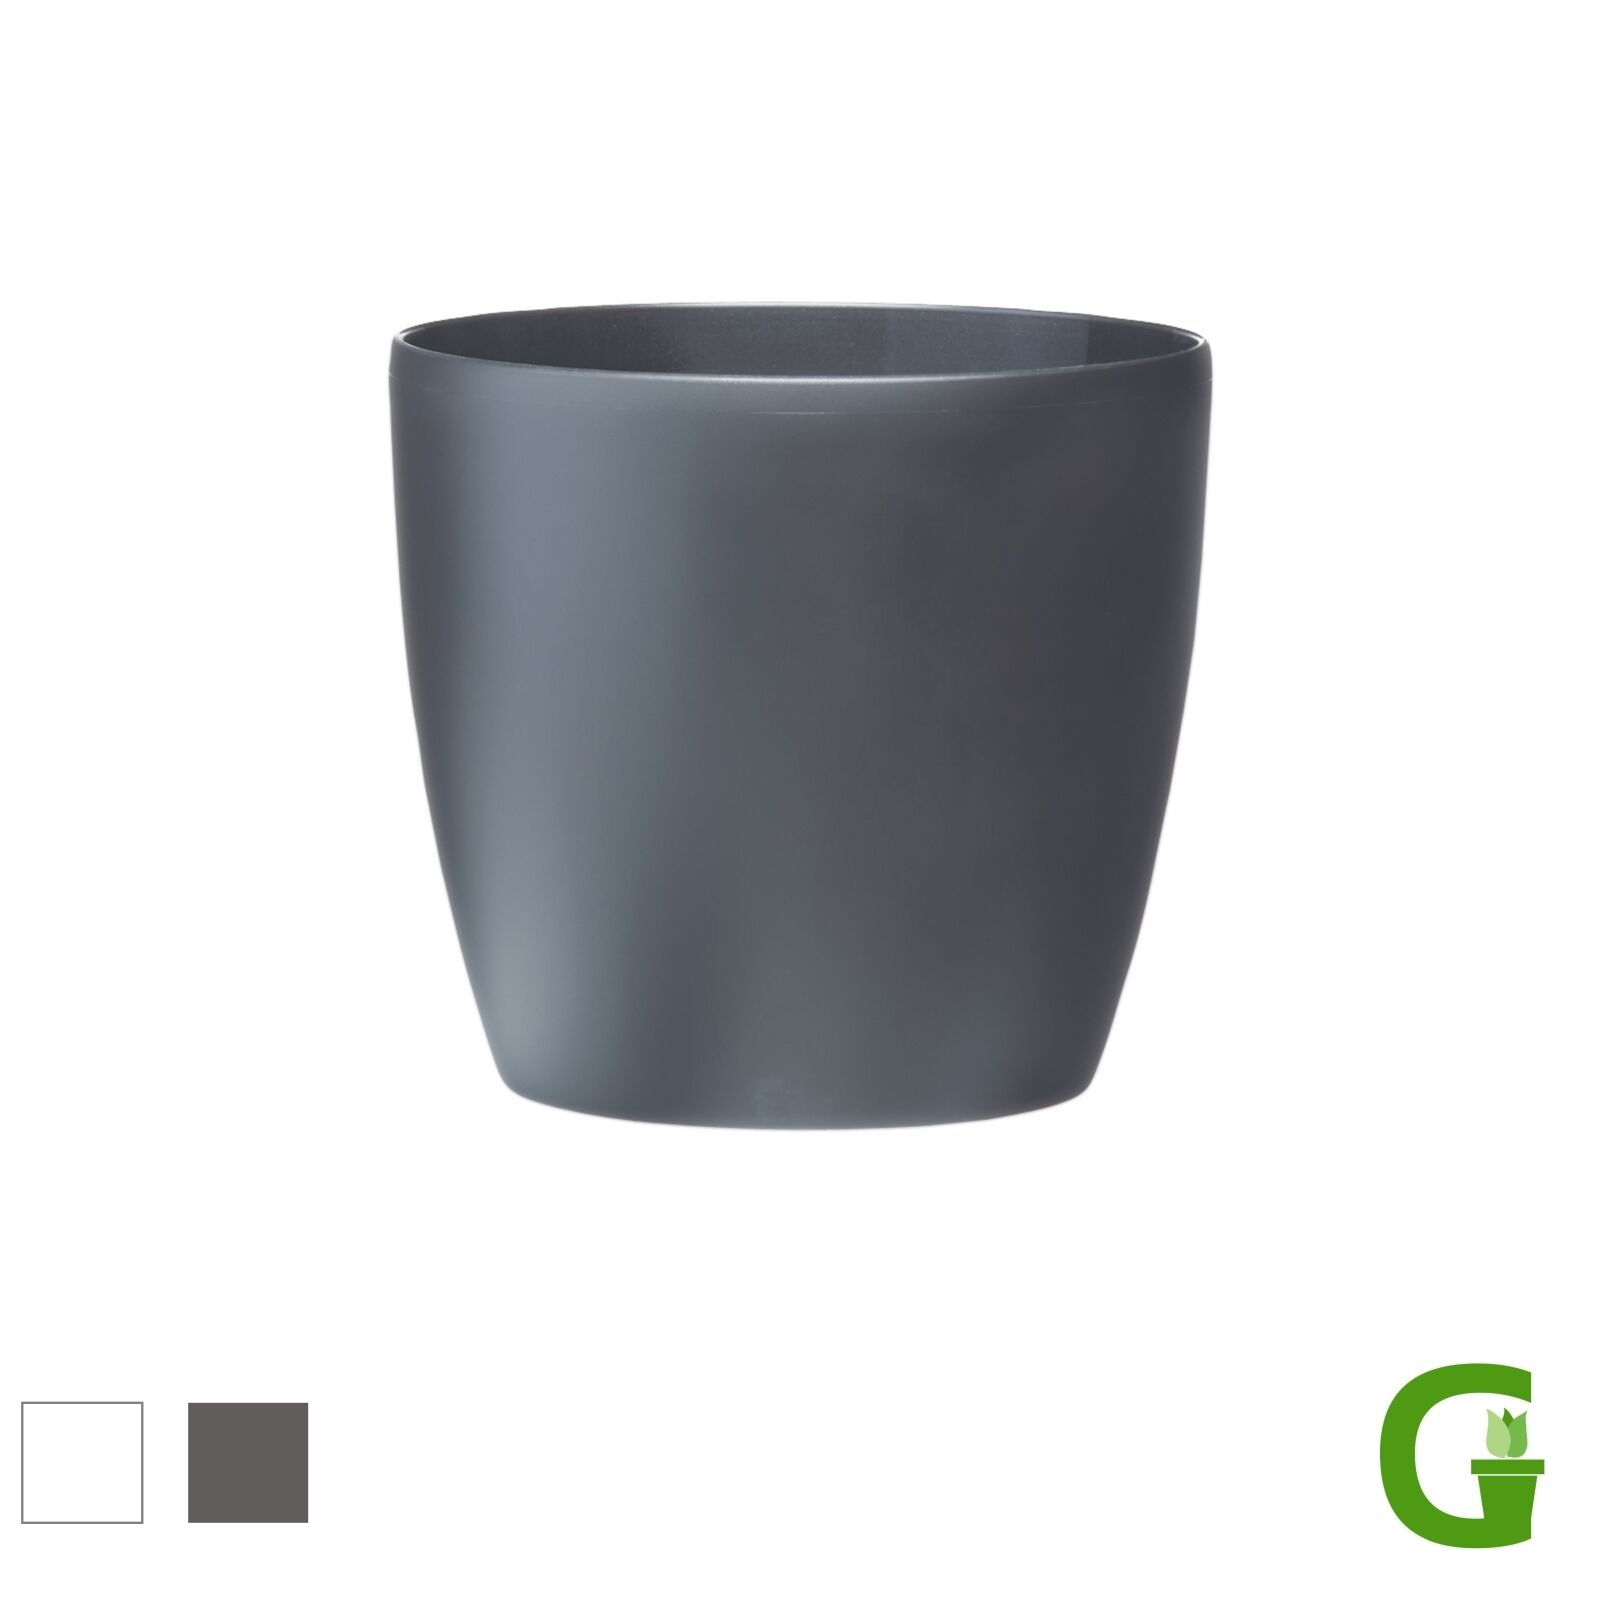 elho brussels round wheels gro er blumen bertopf mit rollen blumentopf modern ebay. Black Bedroom Furniture Sets. Home Design Ideas